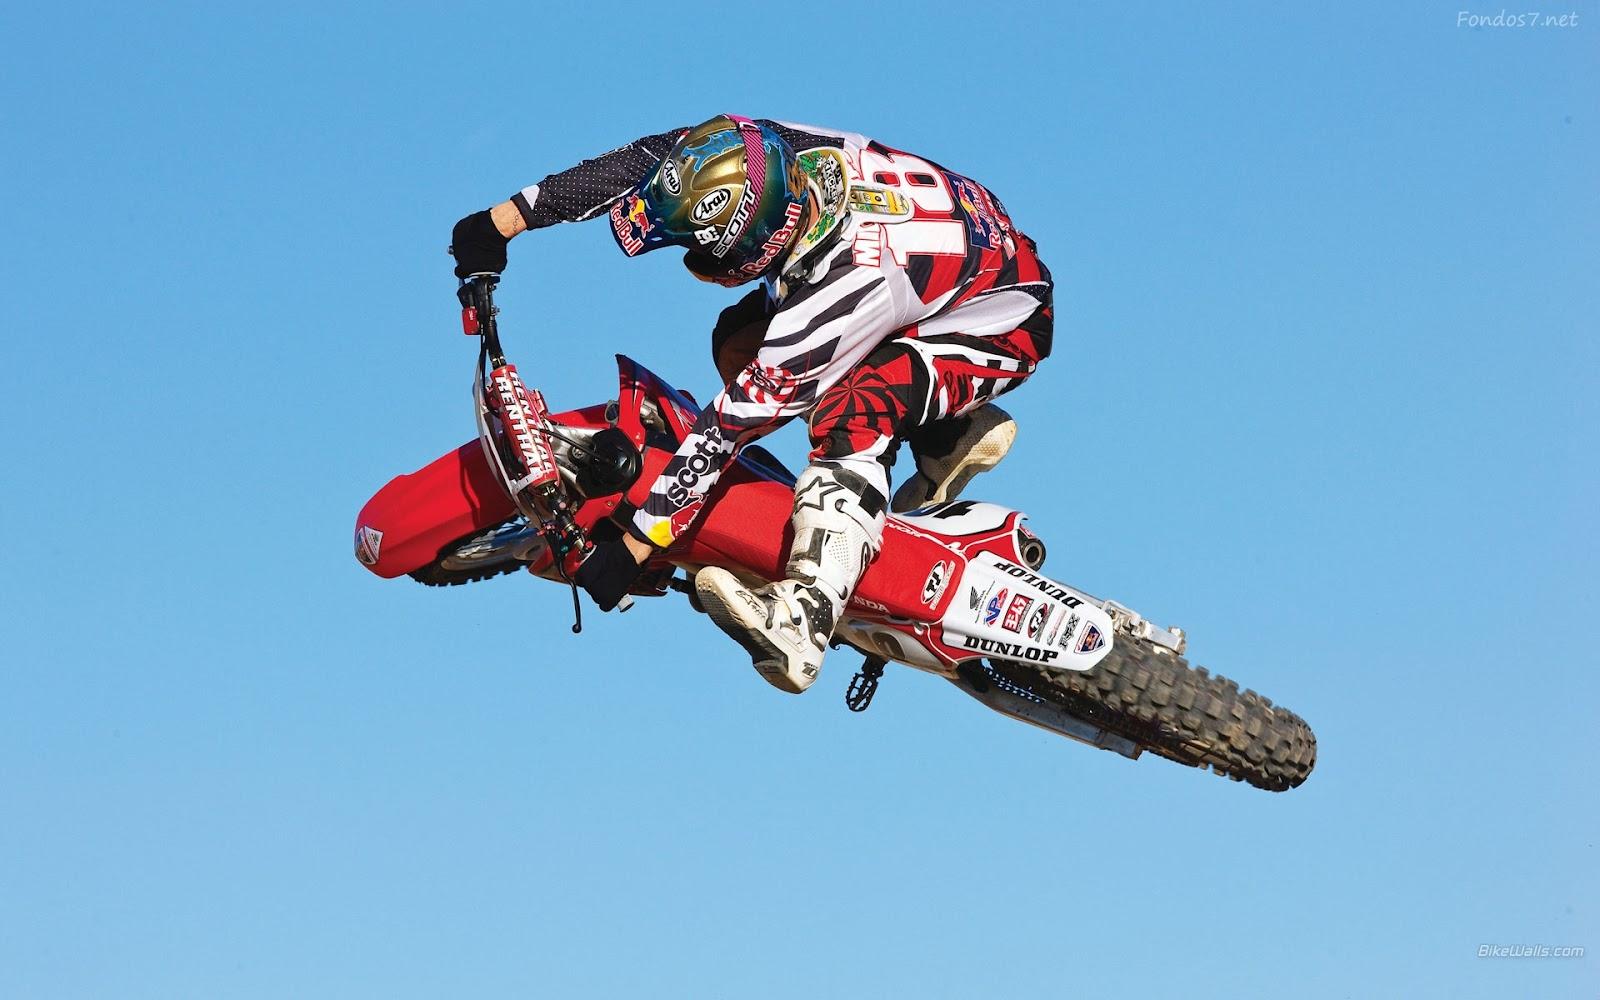 fast pics2: freestyle-motocross-wallpaper%2B2.jpg